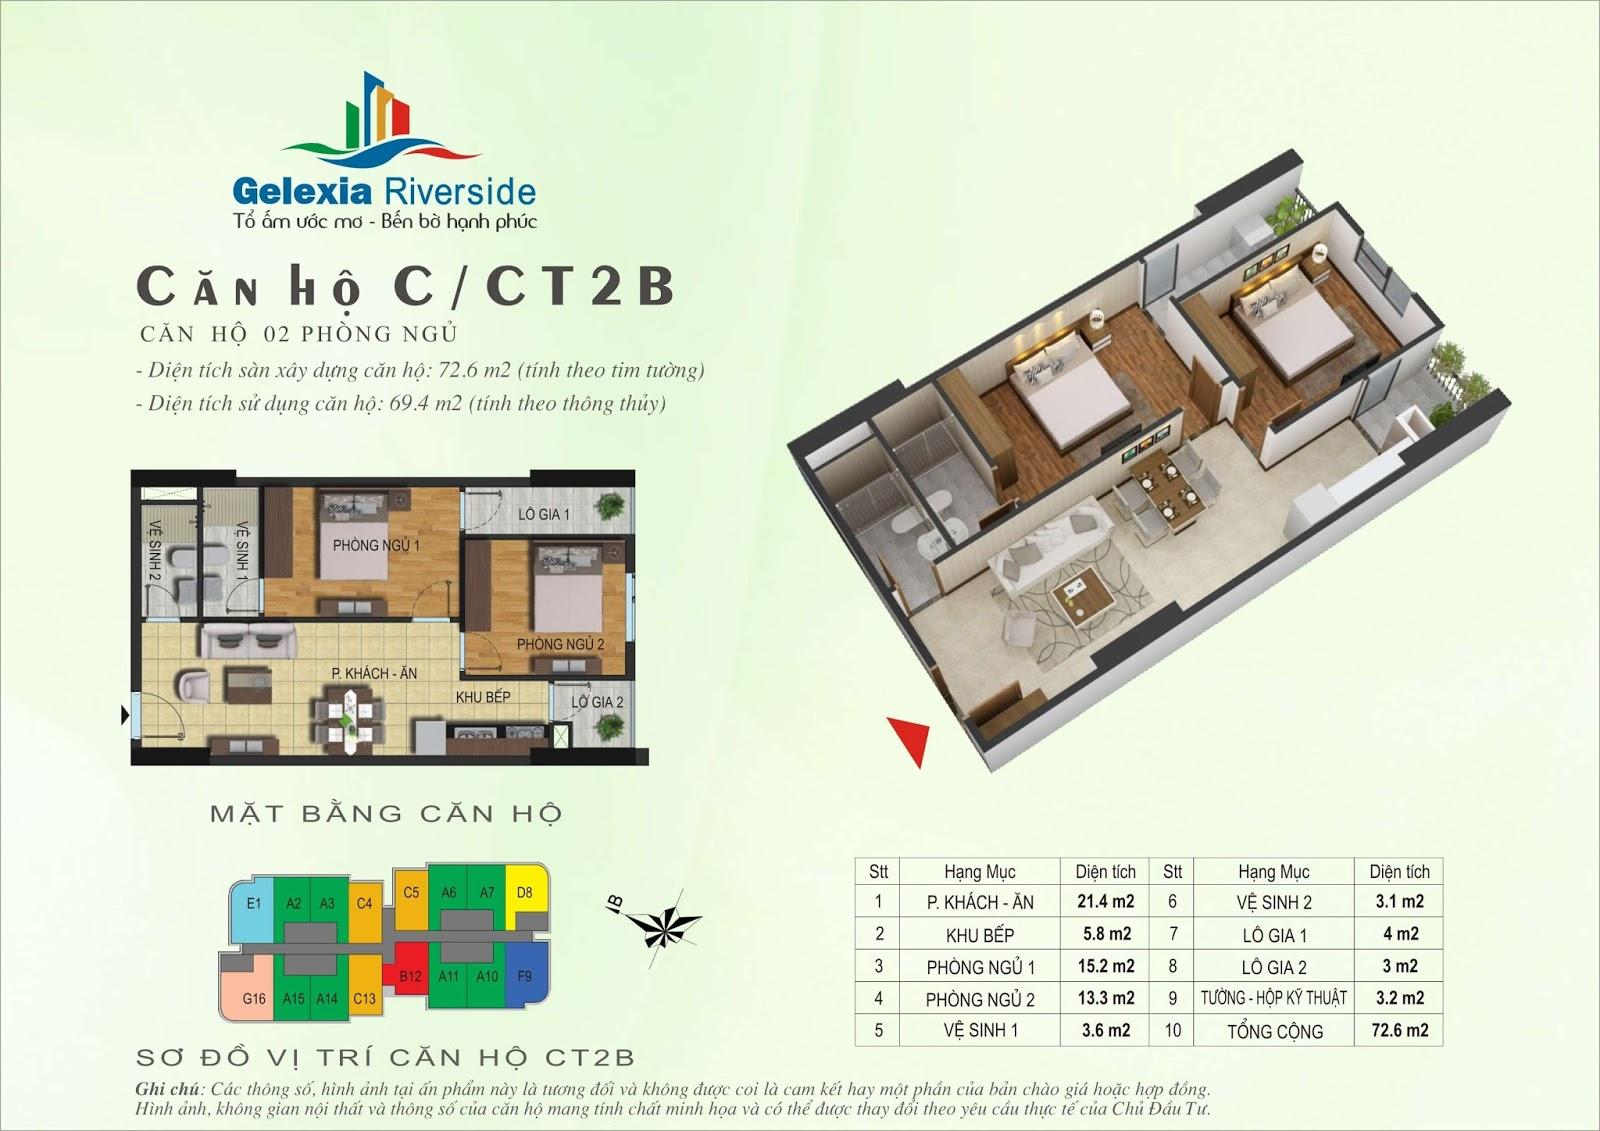 Mặt bằng căn hộ 72,6 m2 tòa CT2B - Gelexia Riverside